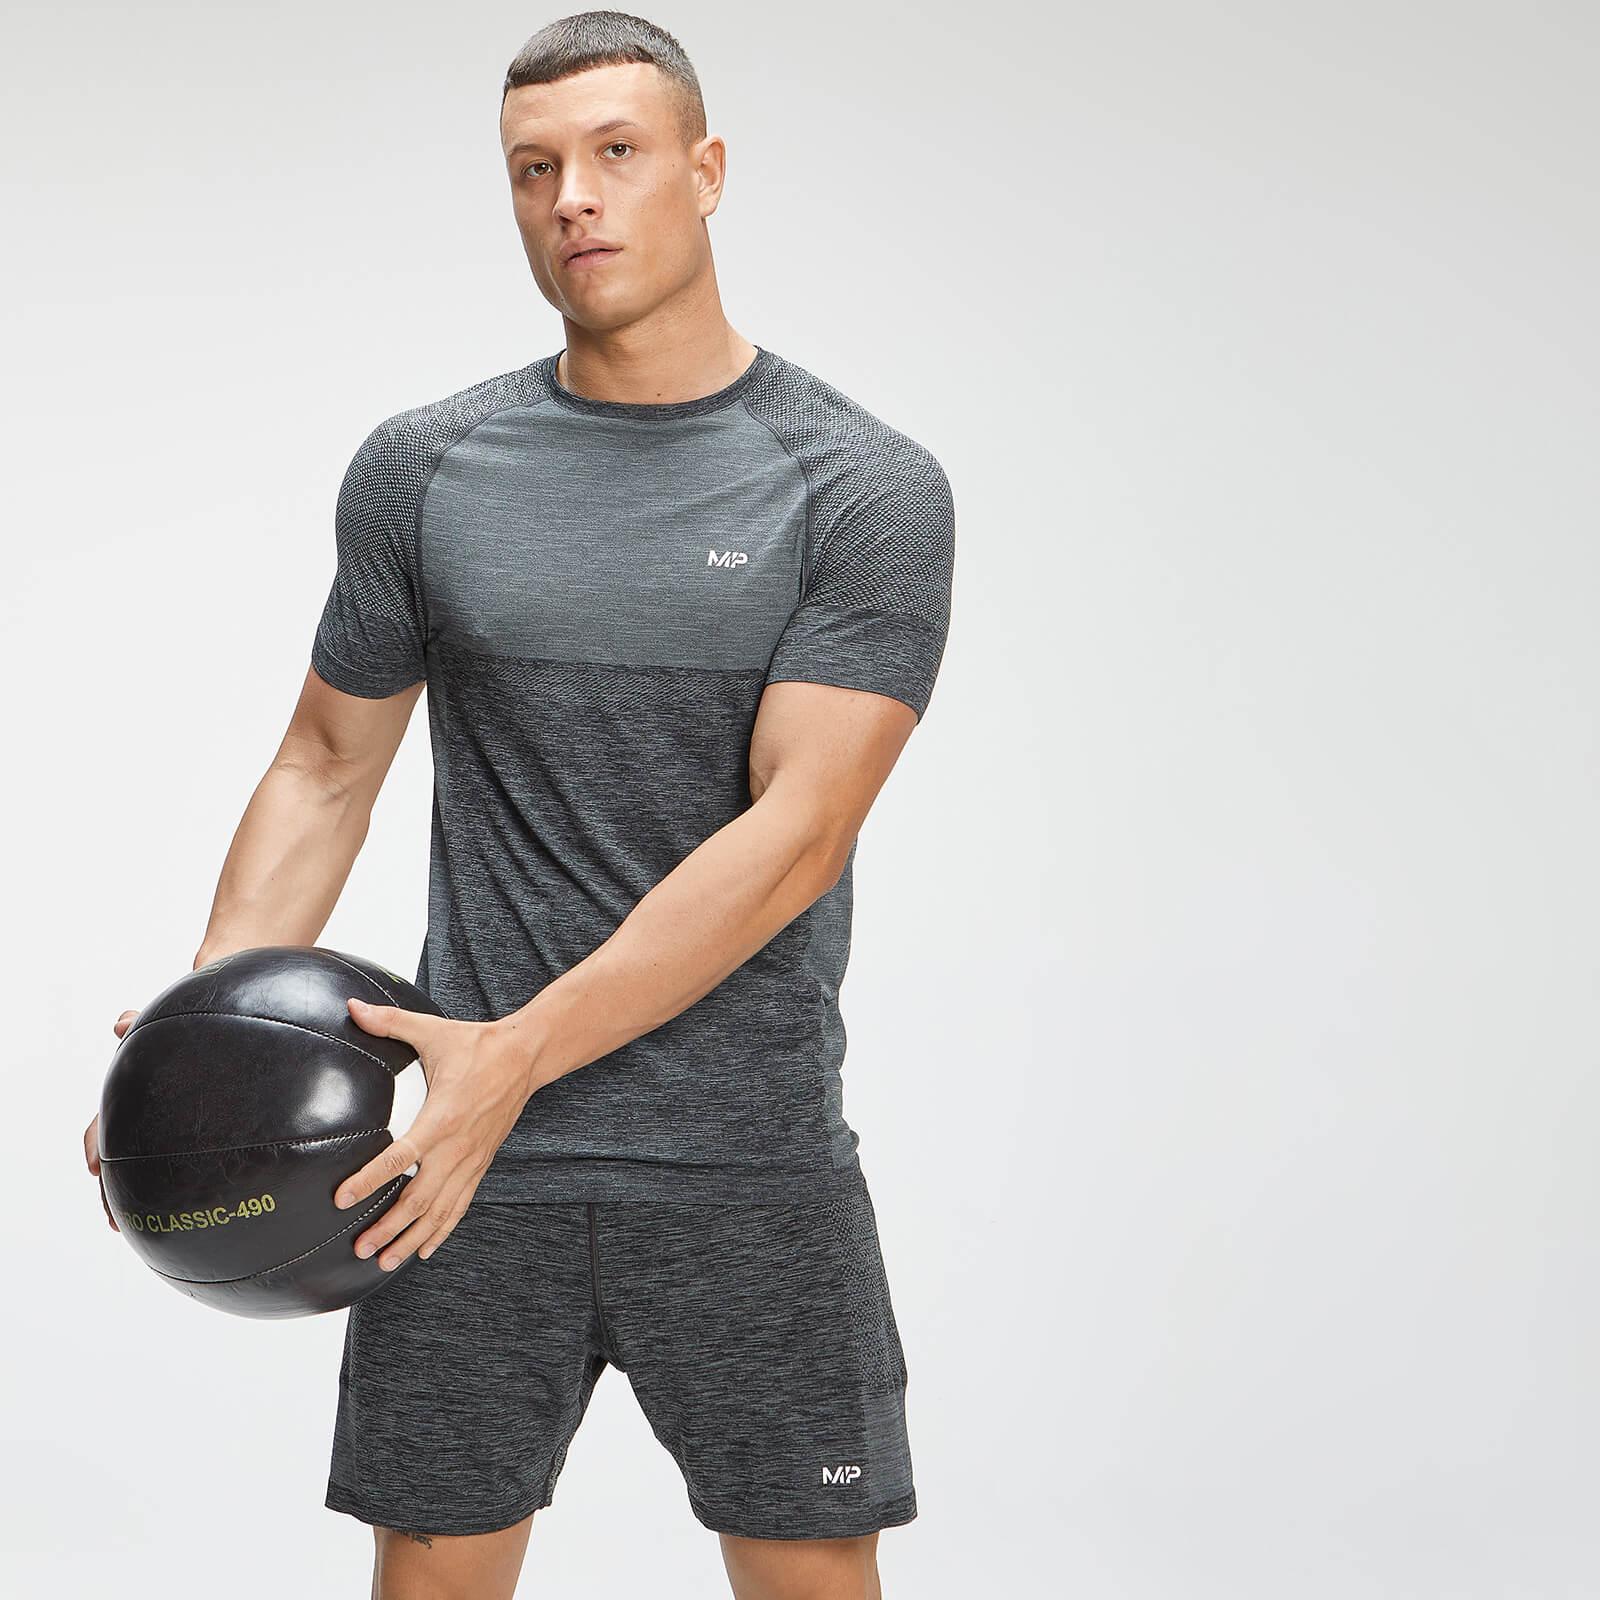 Купить MP Men's Essential Seamless Short Sleeve T-Shirt - Dark Grey Marl - XS, Myprotein International